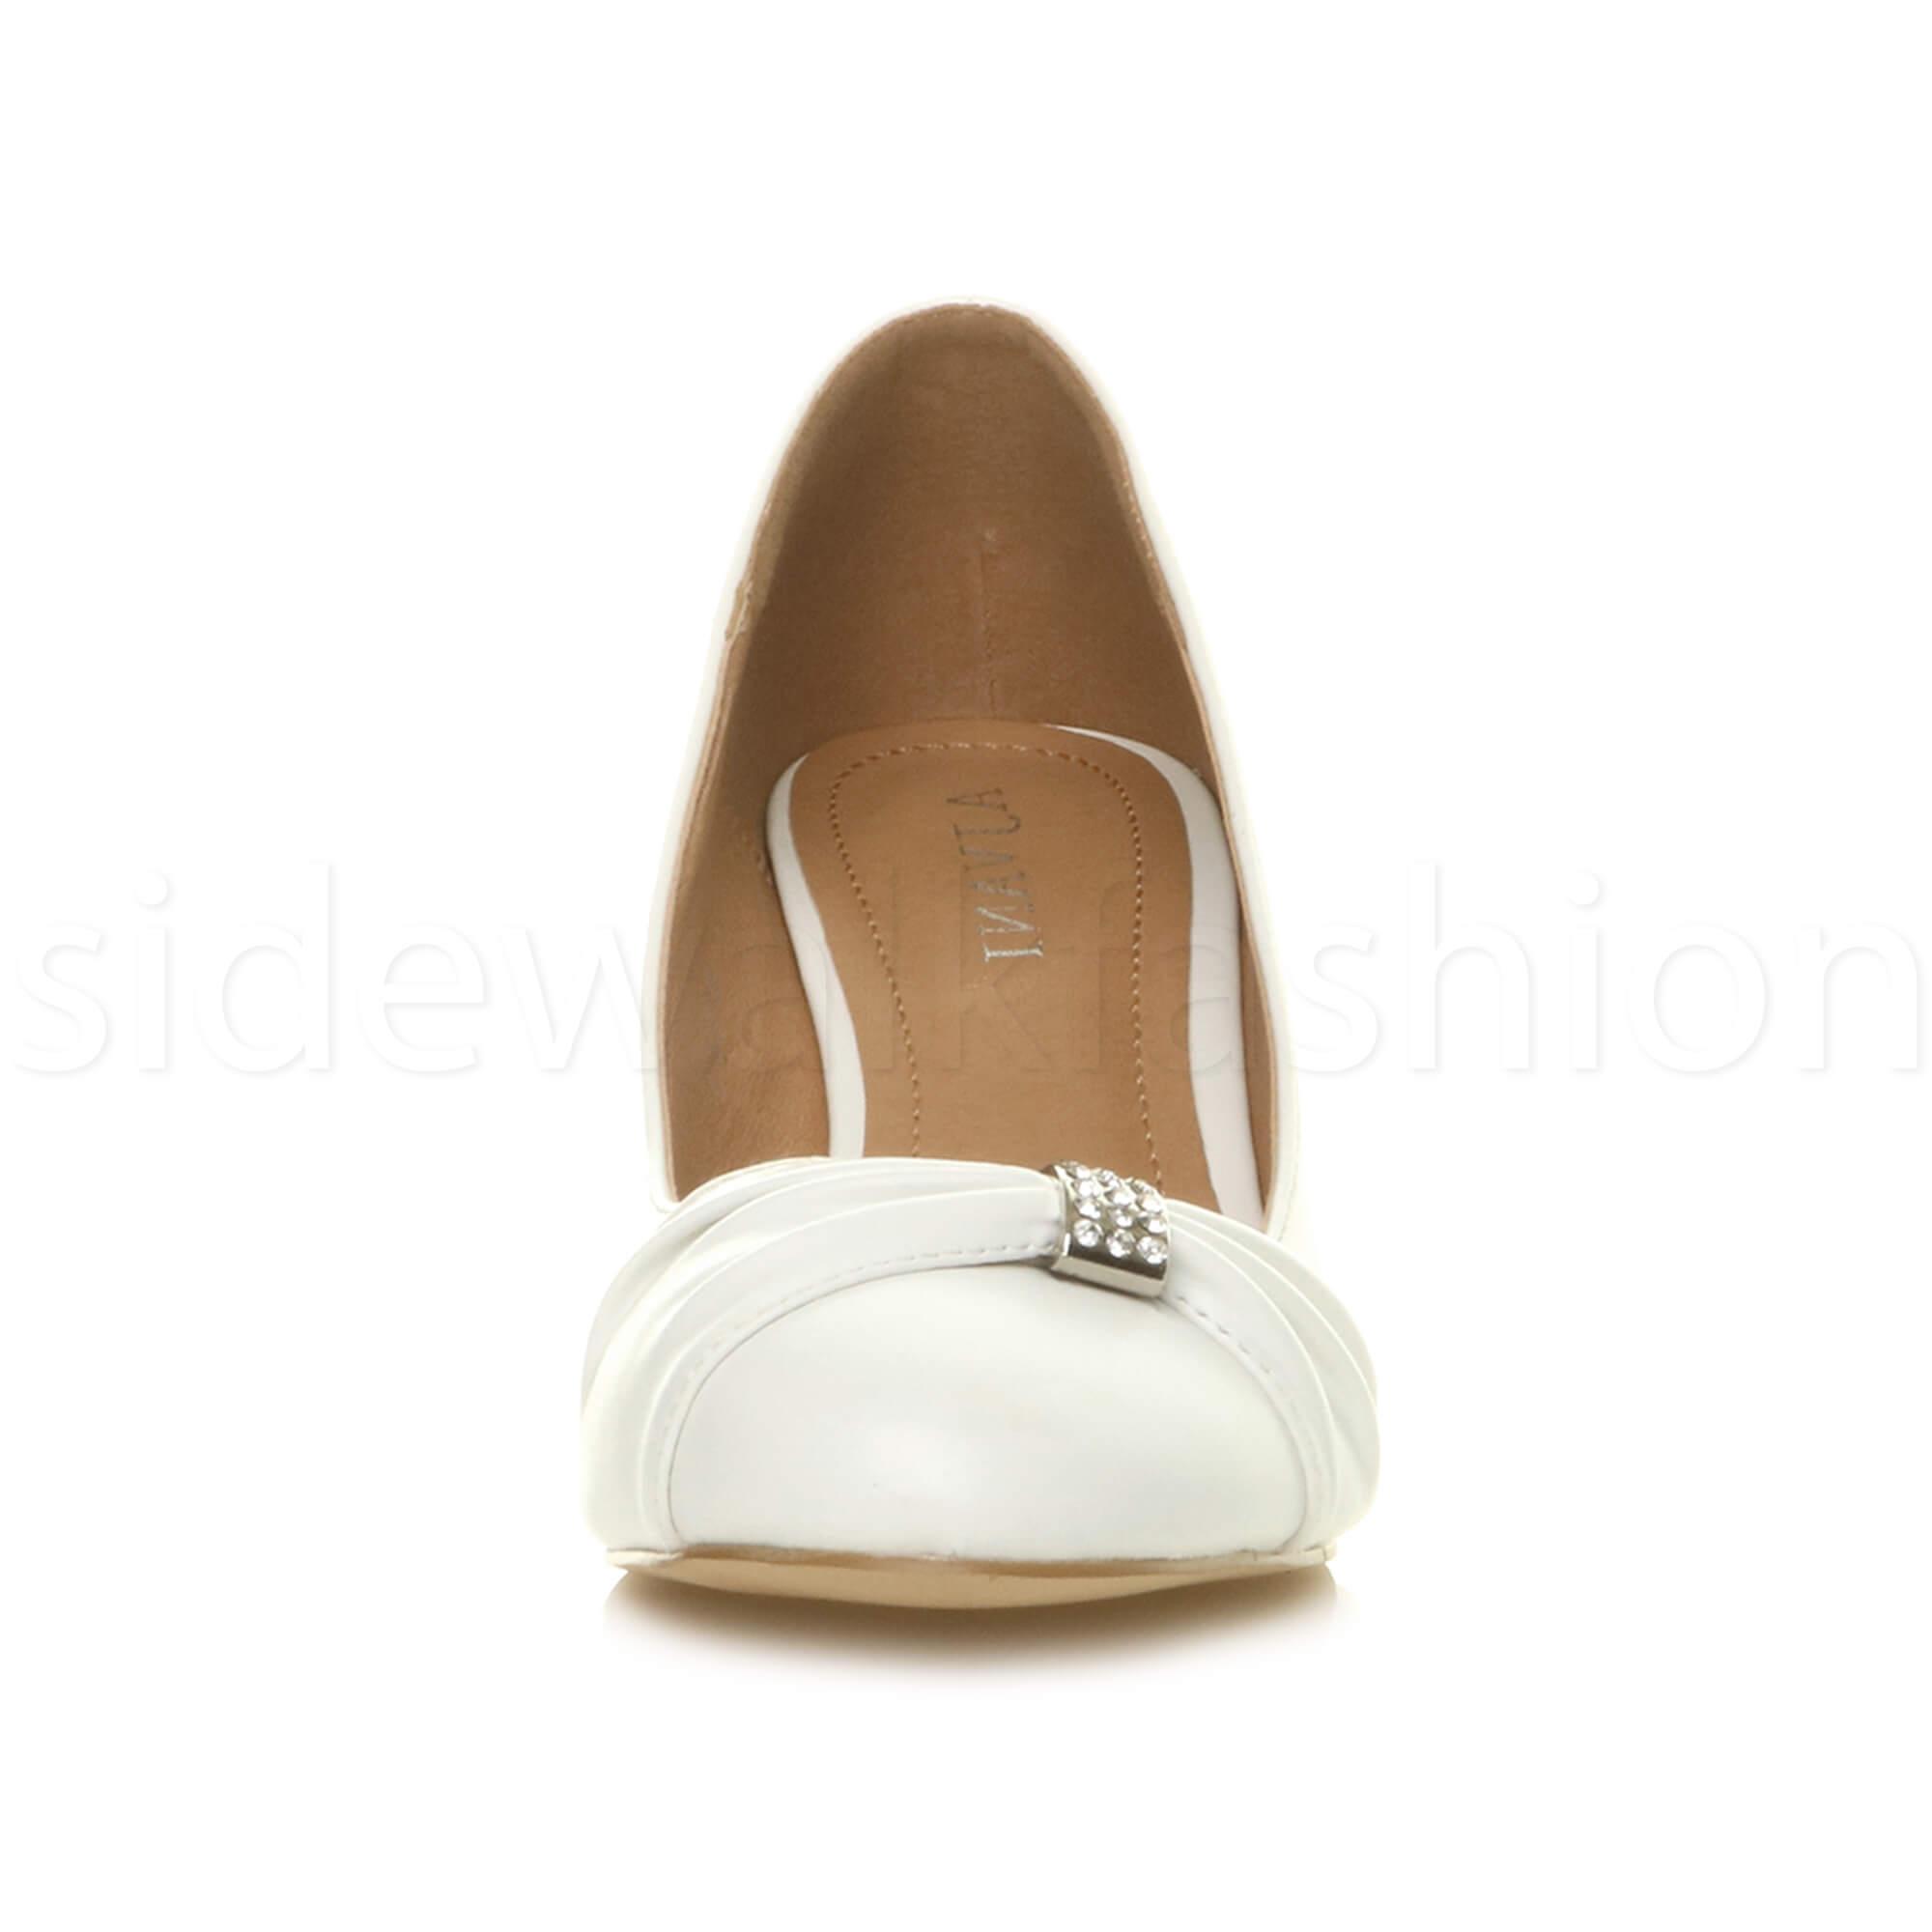 Womens-ladies-low-mid-heel-diamante-party-smart-evening-court-shoes-size thumbnail 103